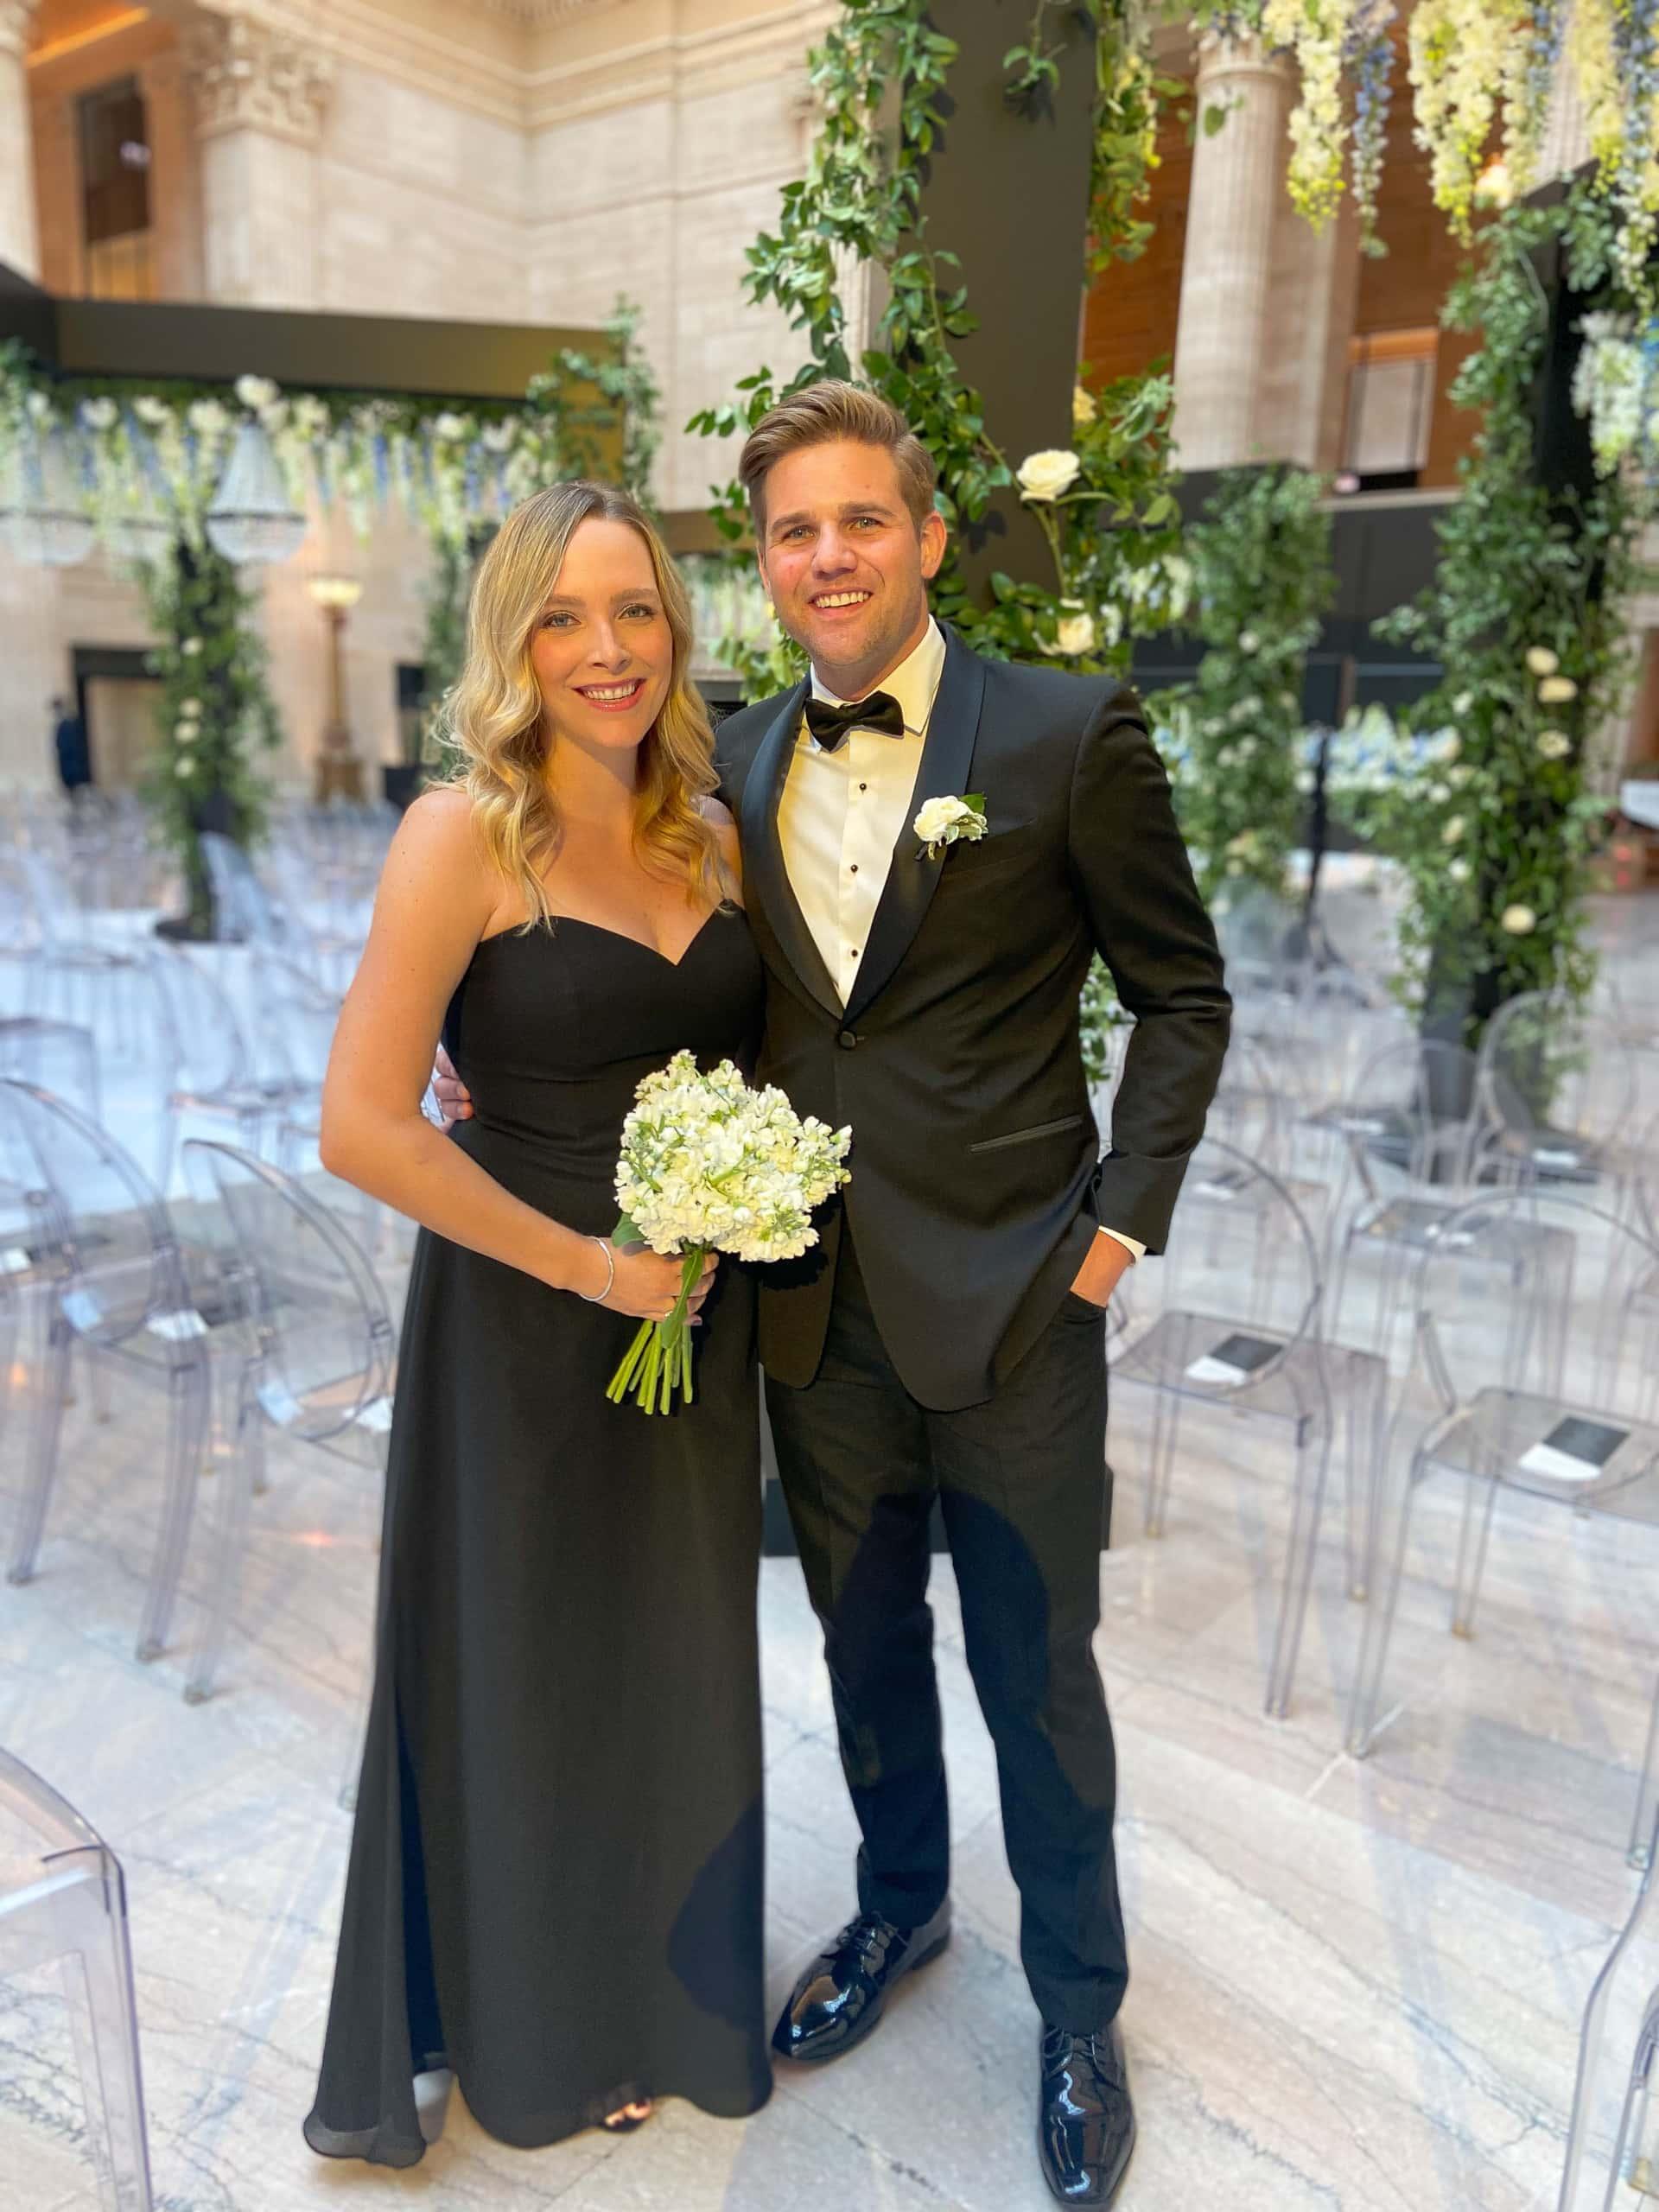 At Ryan & Sarah's wedding